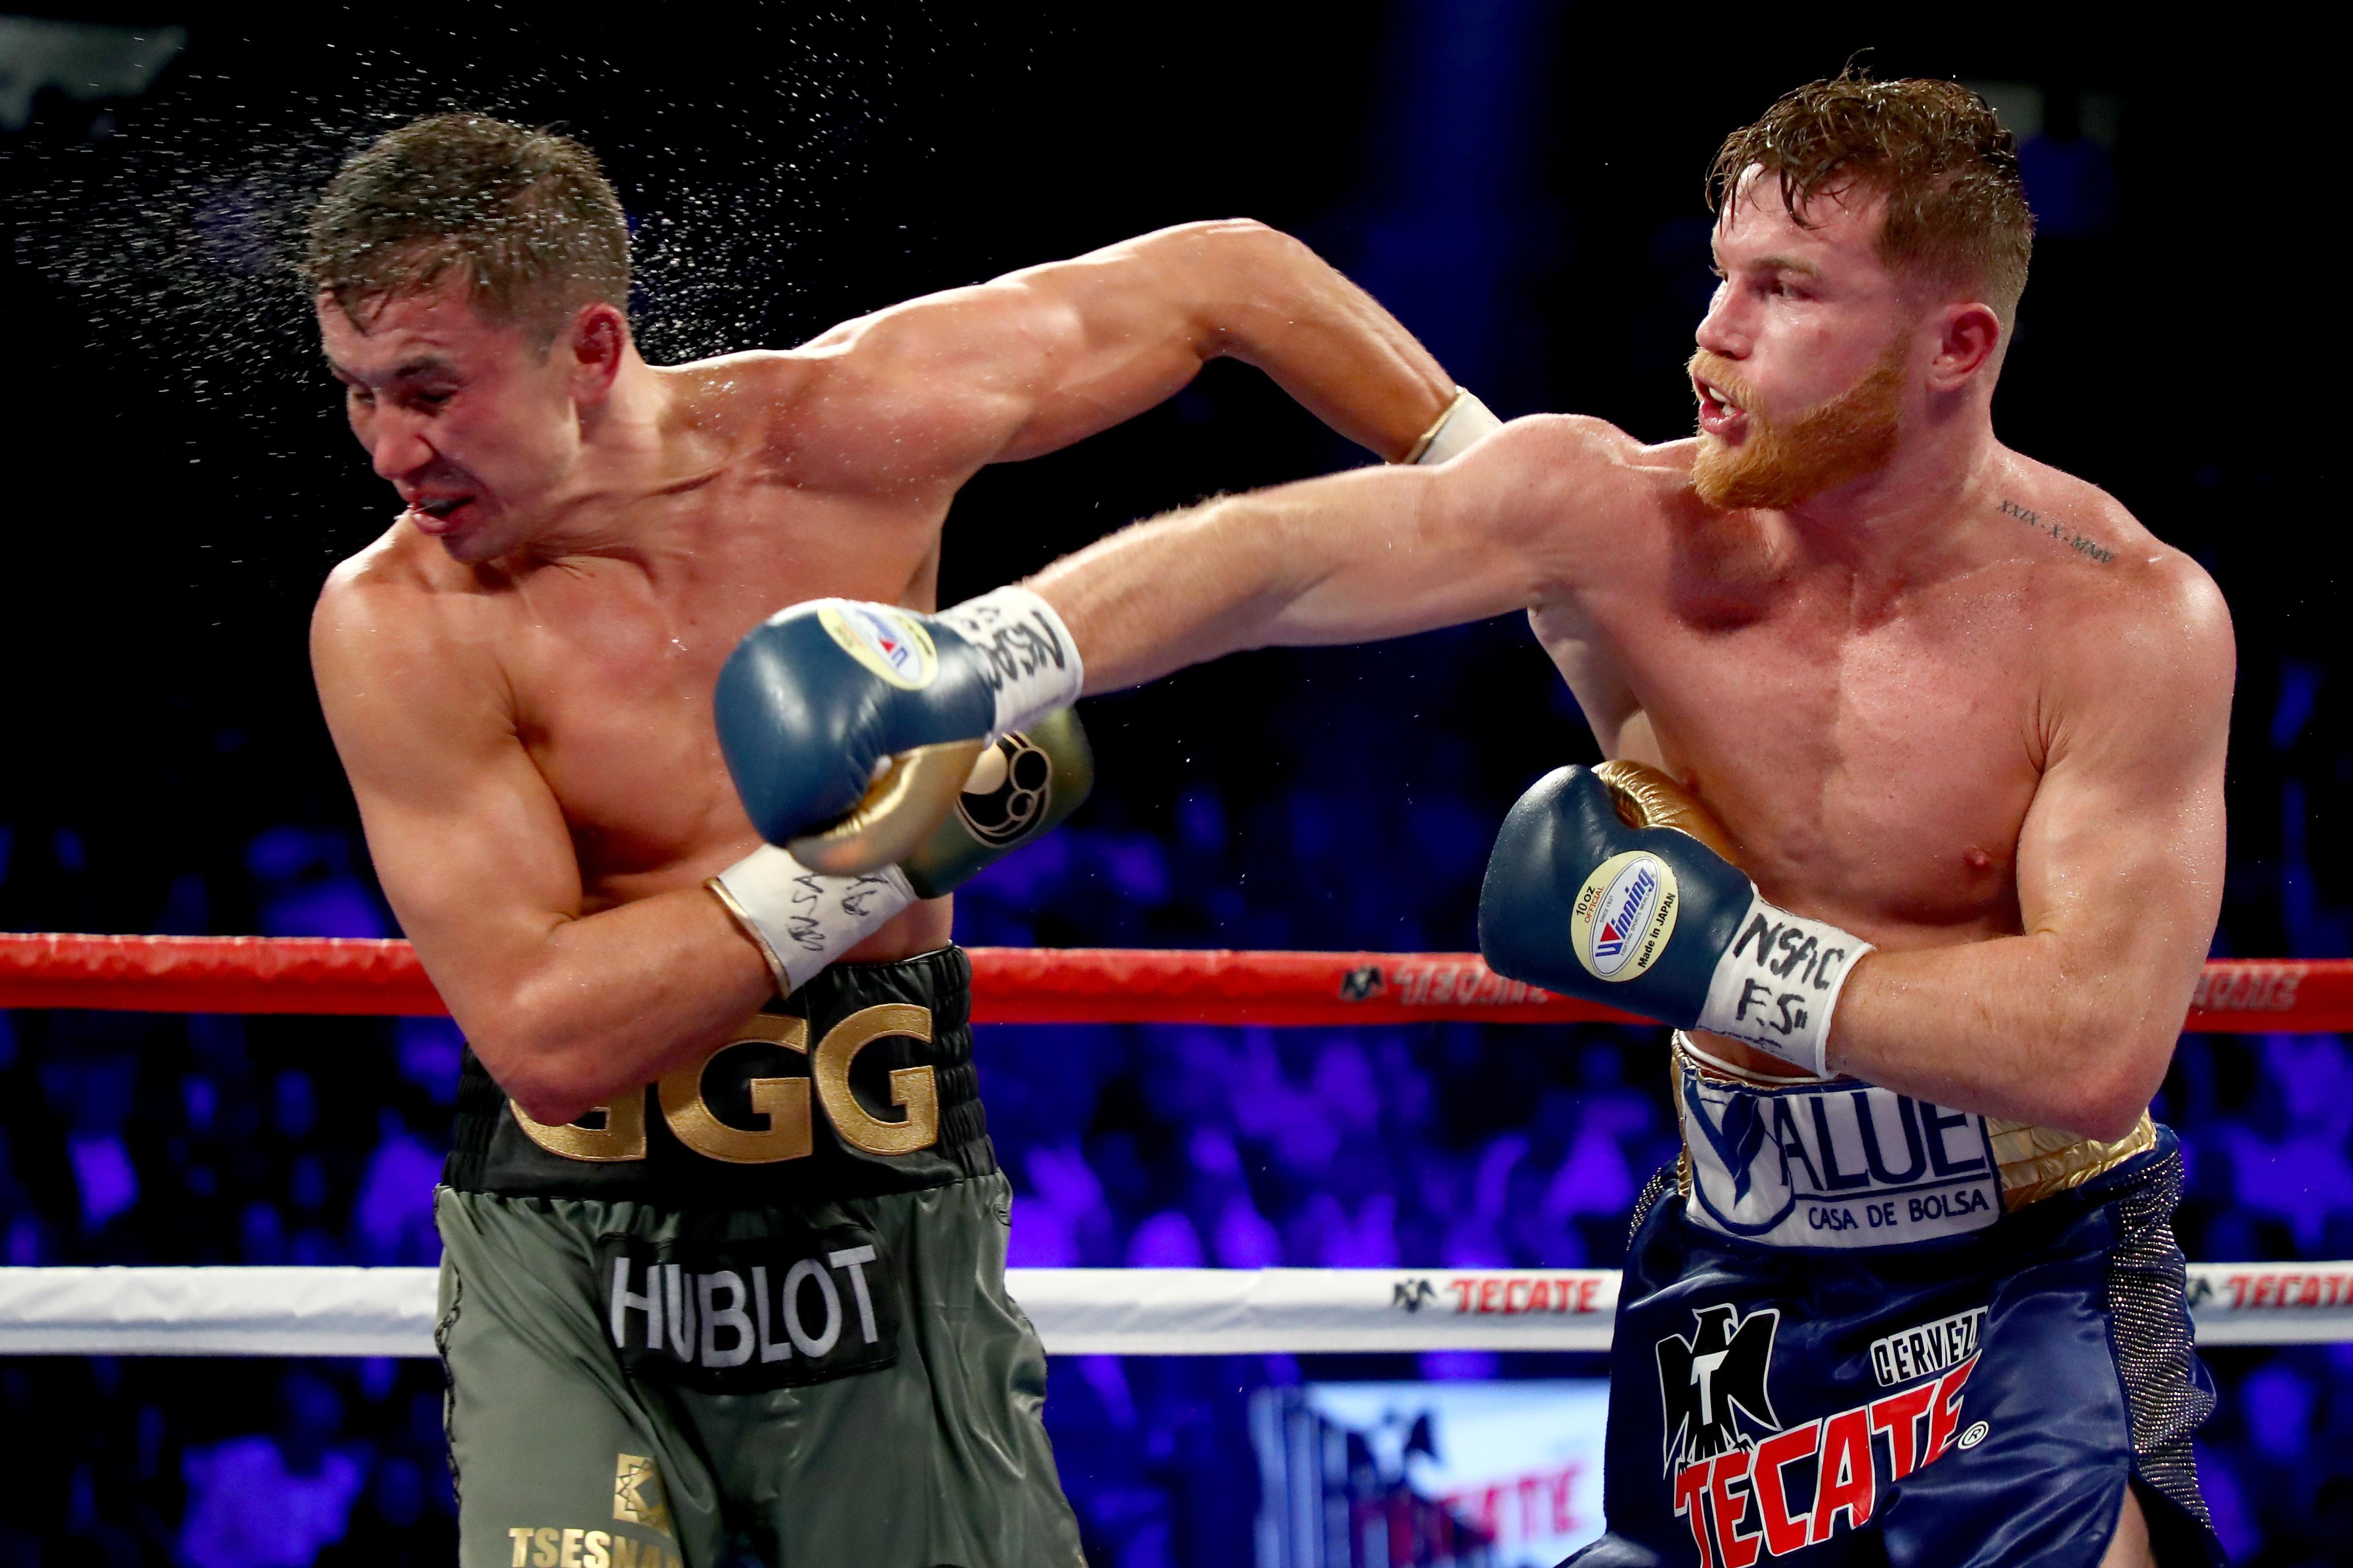 Saul Alvarez and Gennady Golvkin controversially drew their first fight